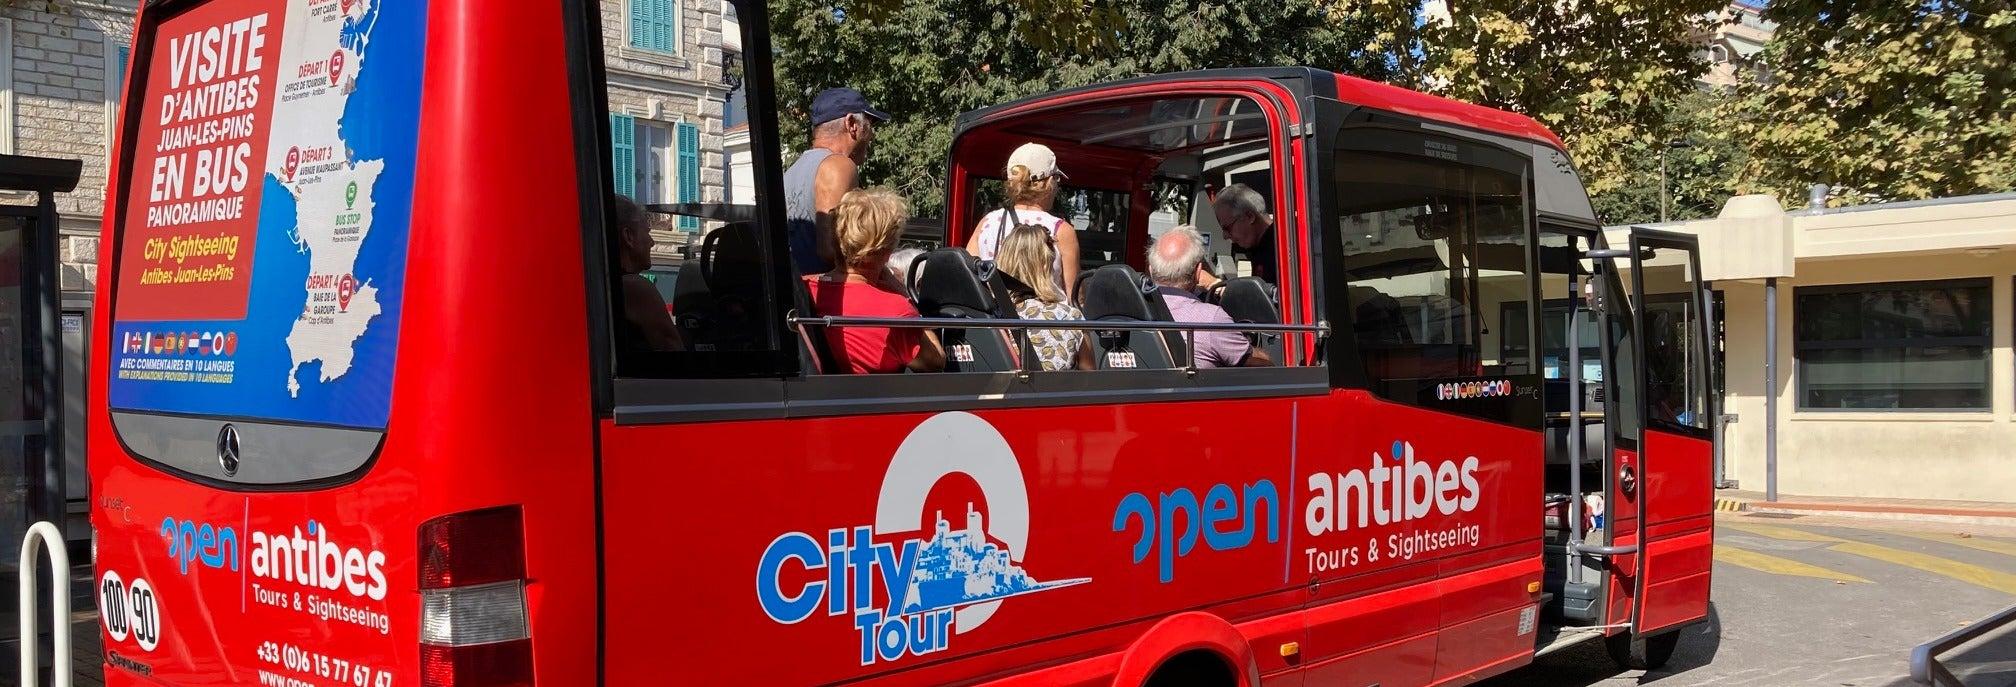 Autobus turistico di Antibes